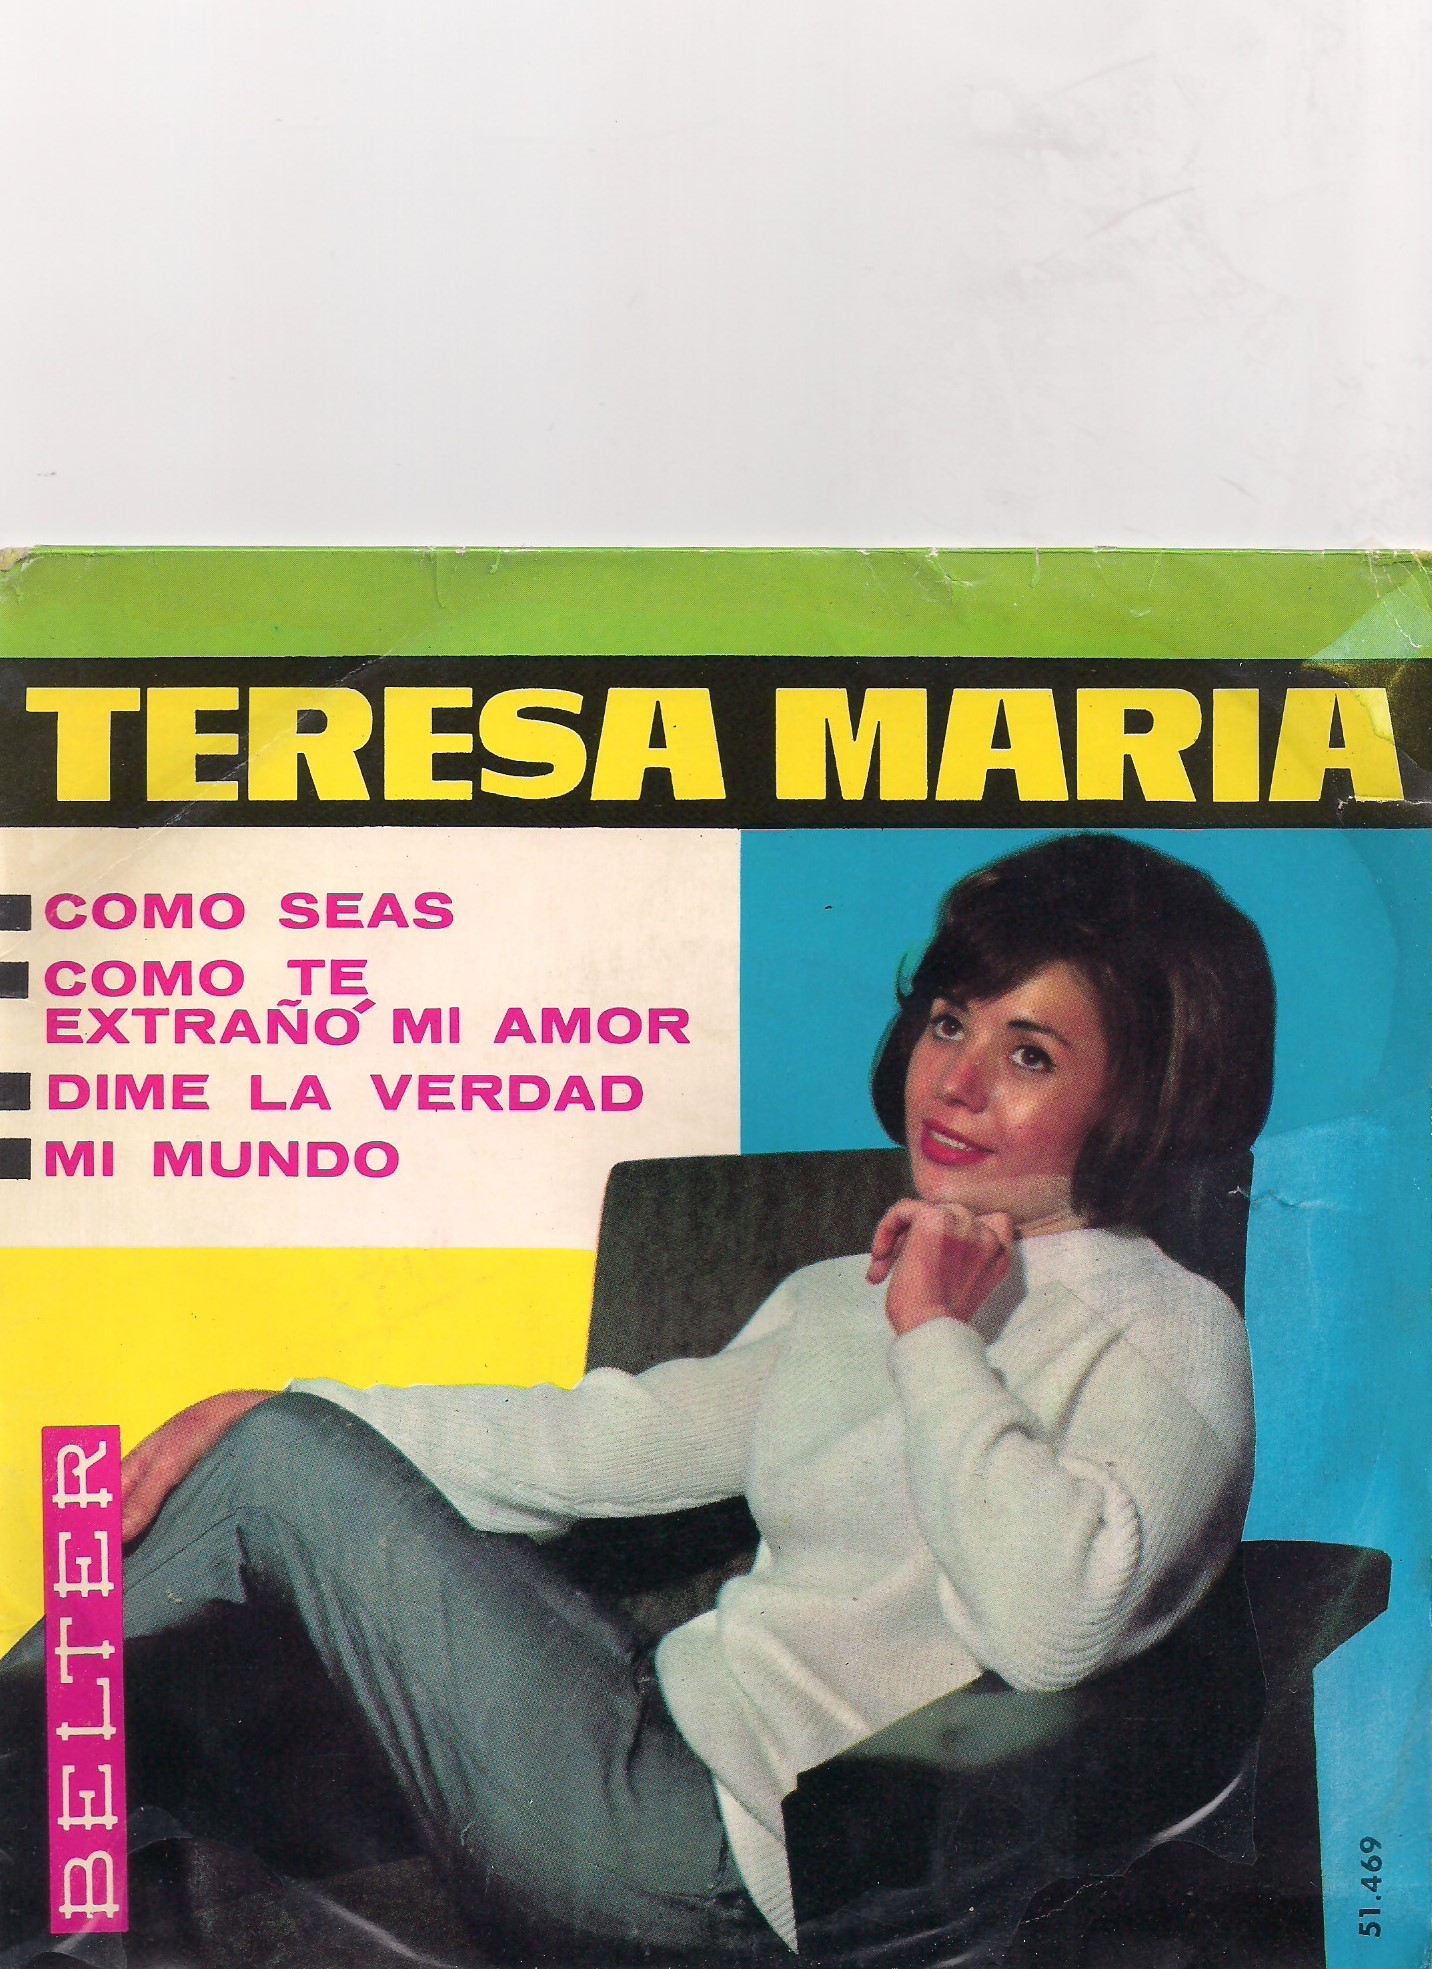 portada del album Como Seas / Como te Extraño mi Amor / Dime la Verdad / Mi Mundo